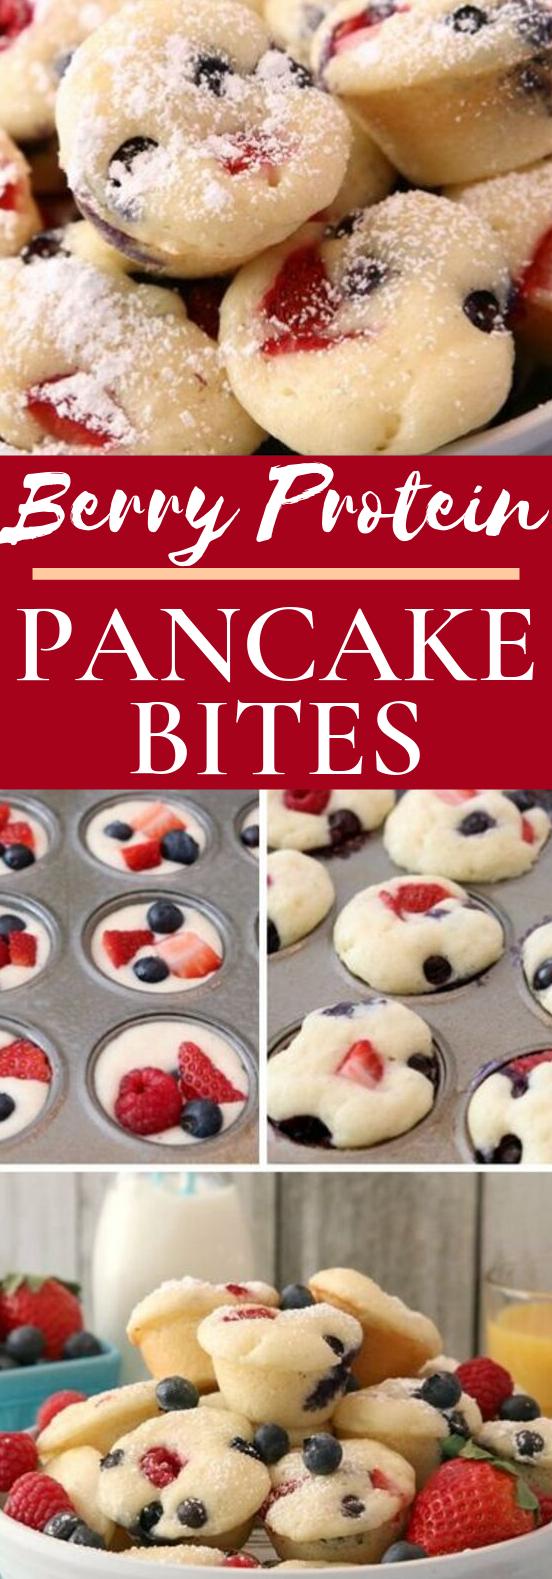 Berry Protein Pancake Bites #healthy #breakfast